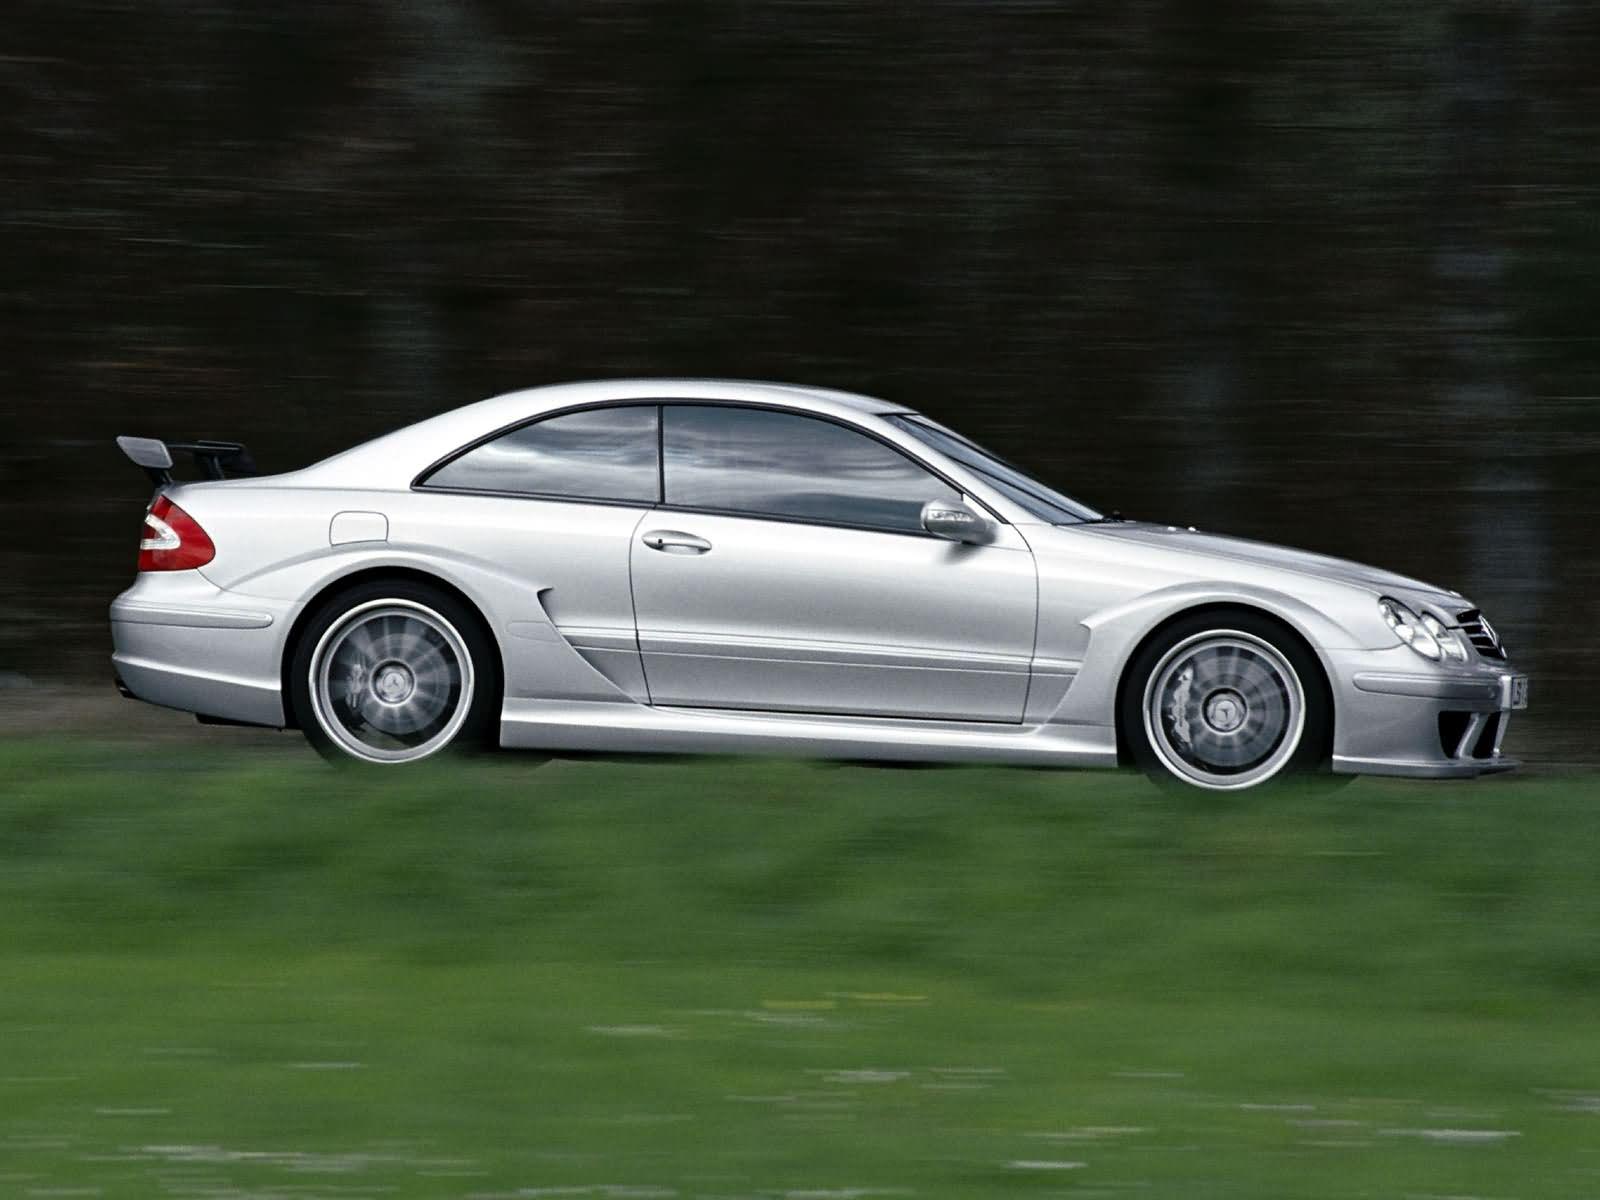 Mercedes benz clk dtm amg picture 7138 mercedes benz for Mercedes benz clk dtm